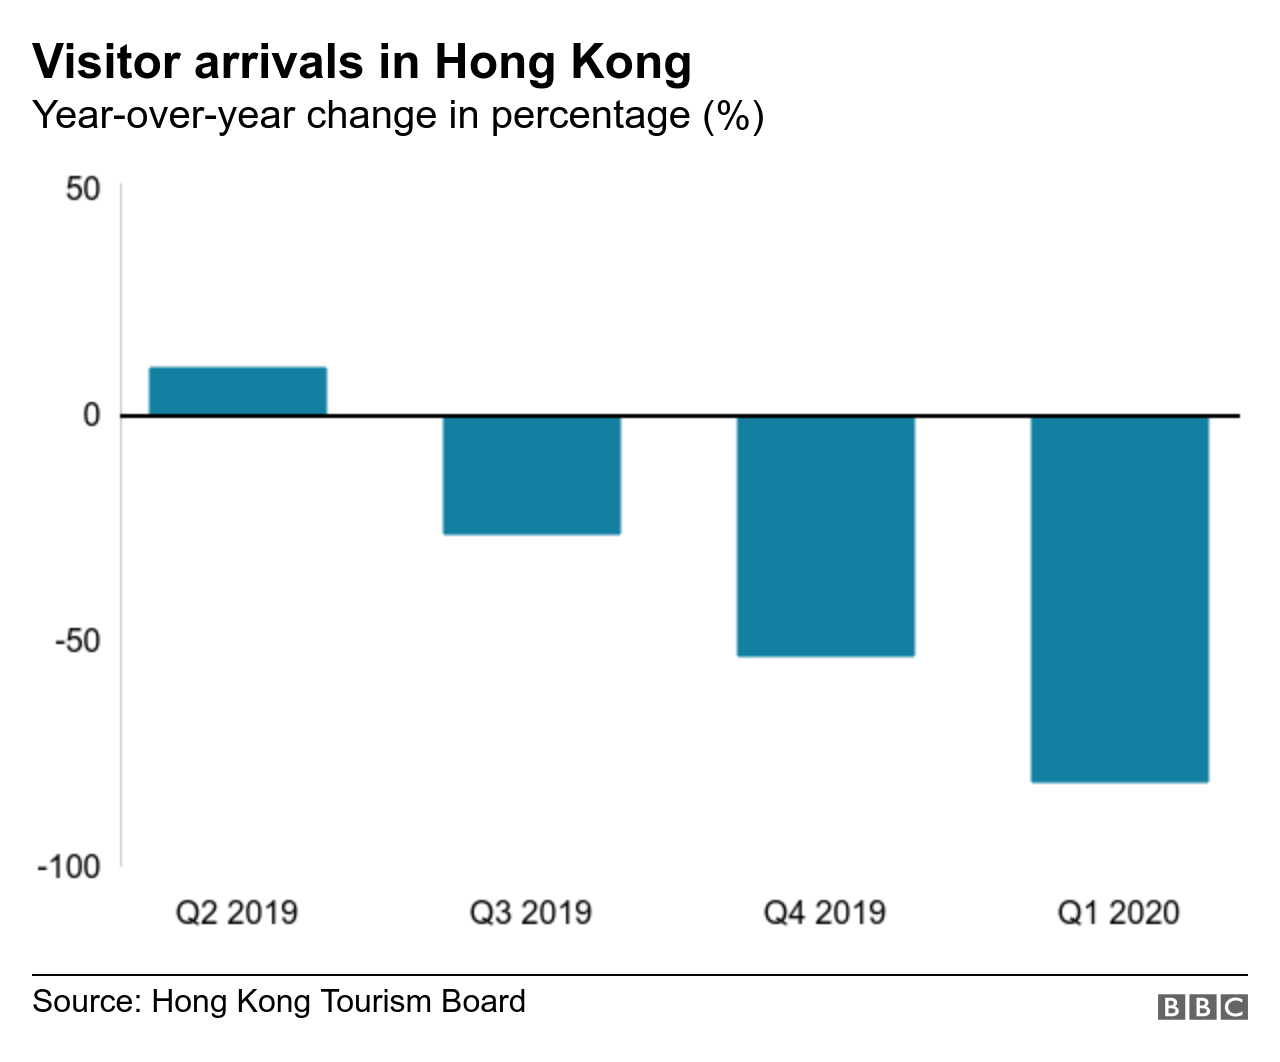 Visitor arrivals in Hong Kong